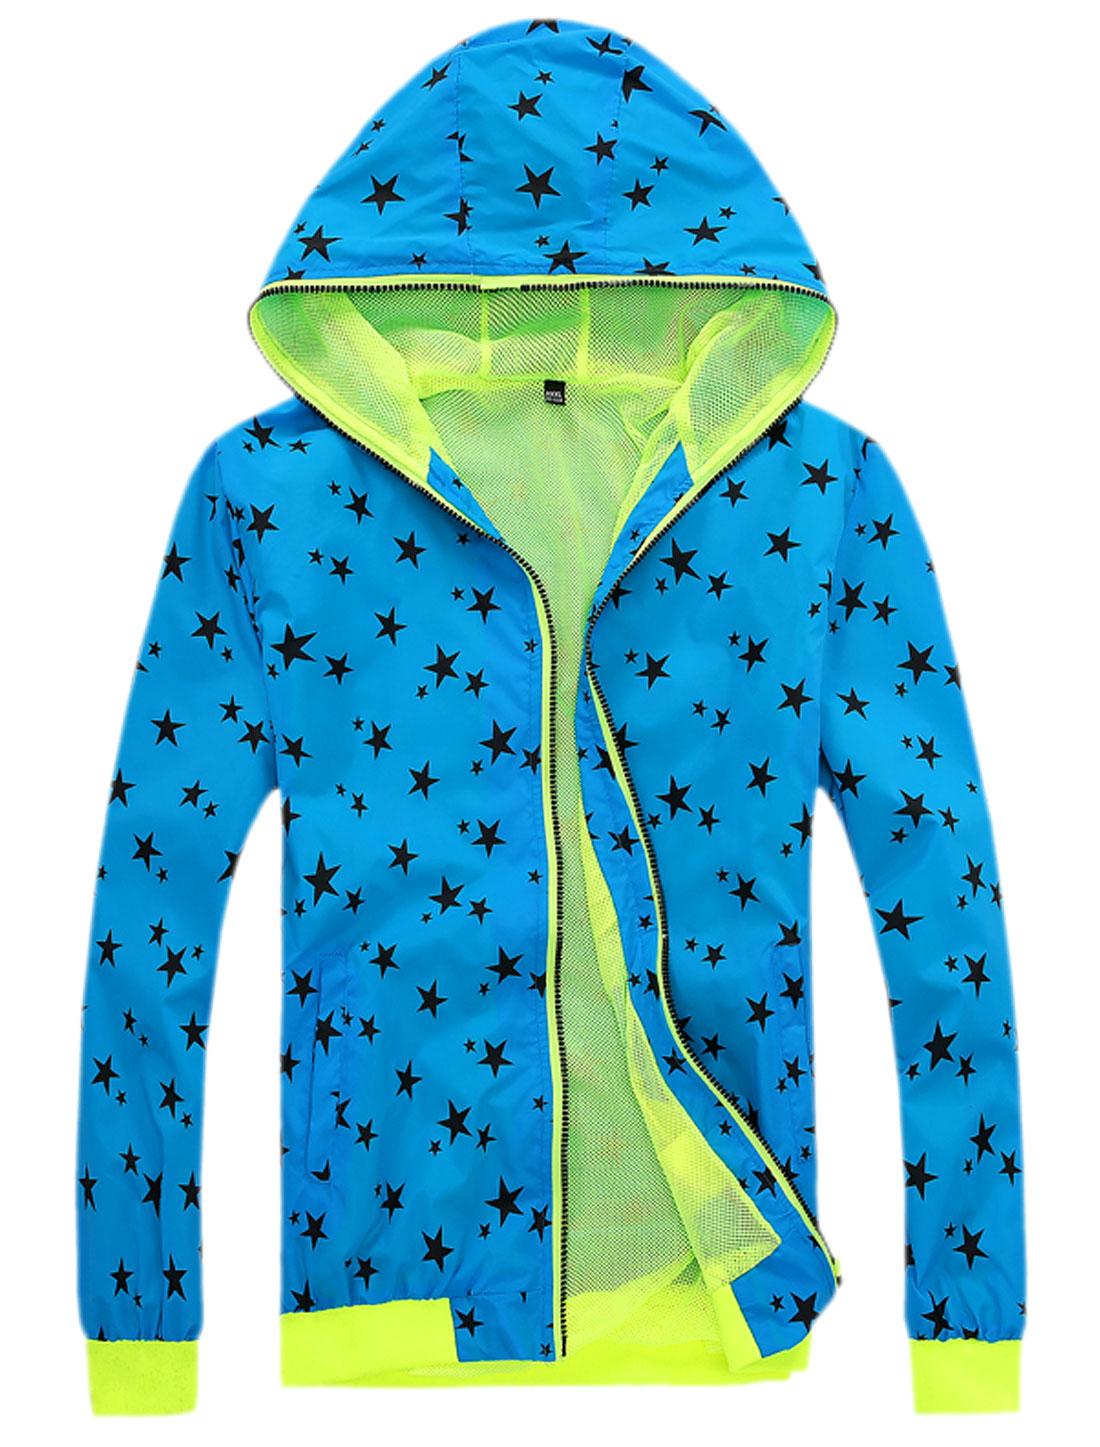 Men Zip Up Long Sleeve Pockets Stars Pattern Hooded Jackets Blue M